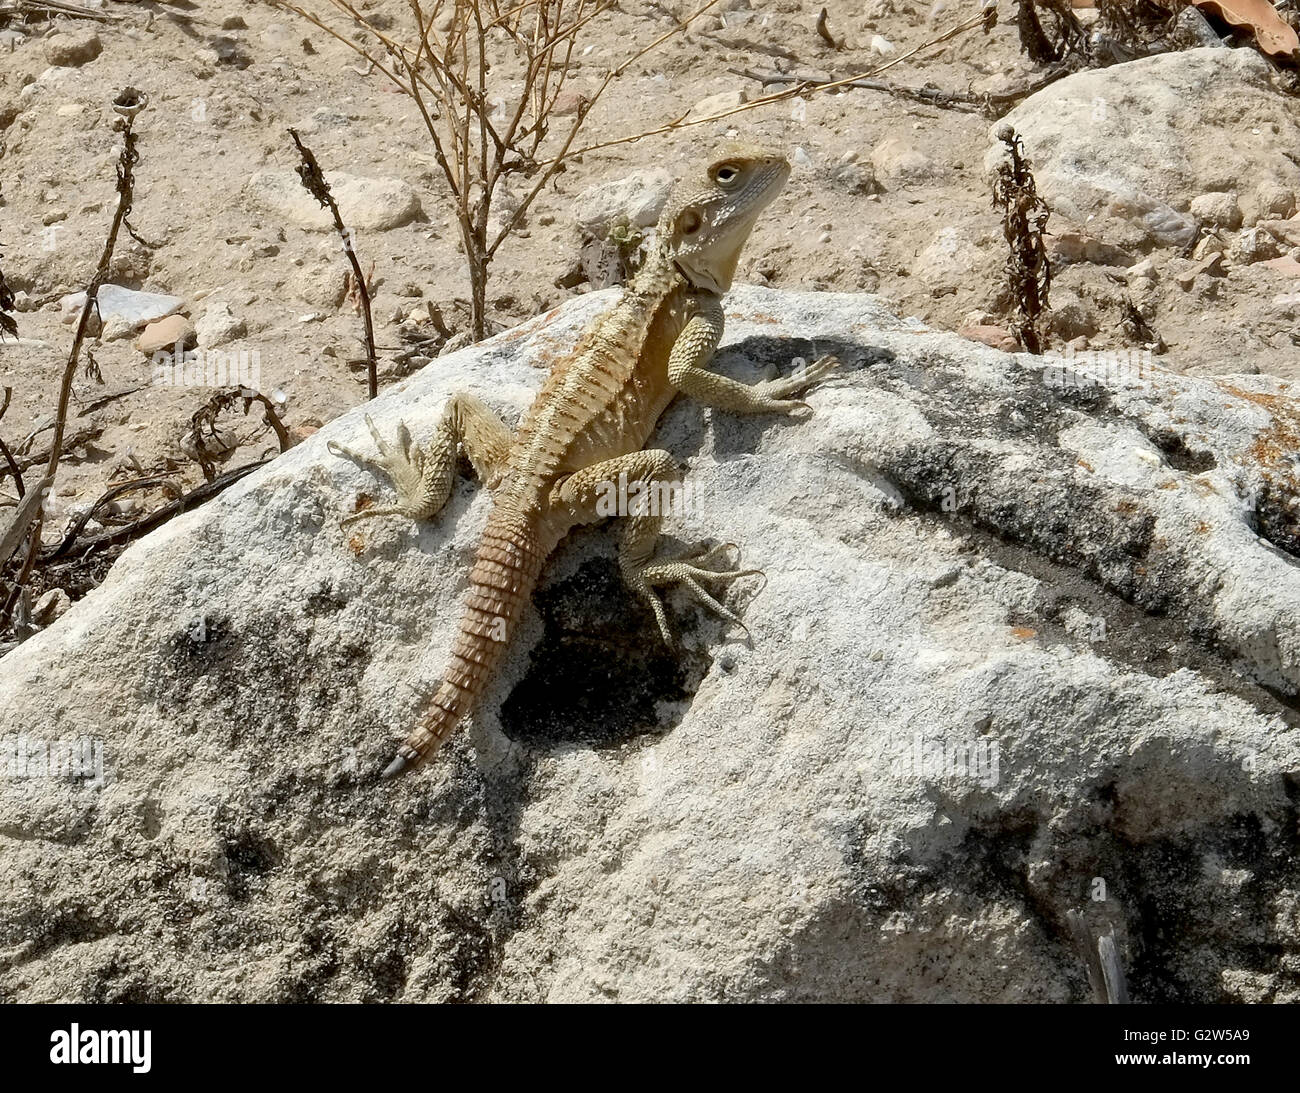 Lézard Gecko (infraordre Gekkota) sur un rocher, les salamis, Famagusta, (Gazimagusa), Chypre du Nord. Photo Stock